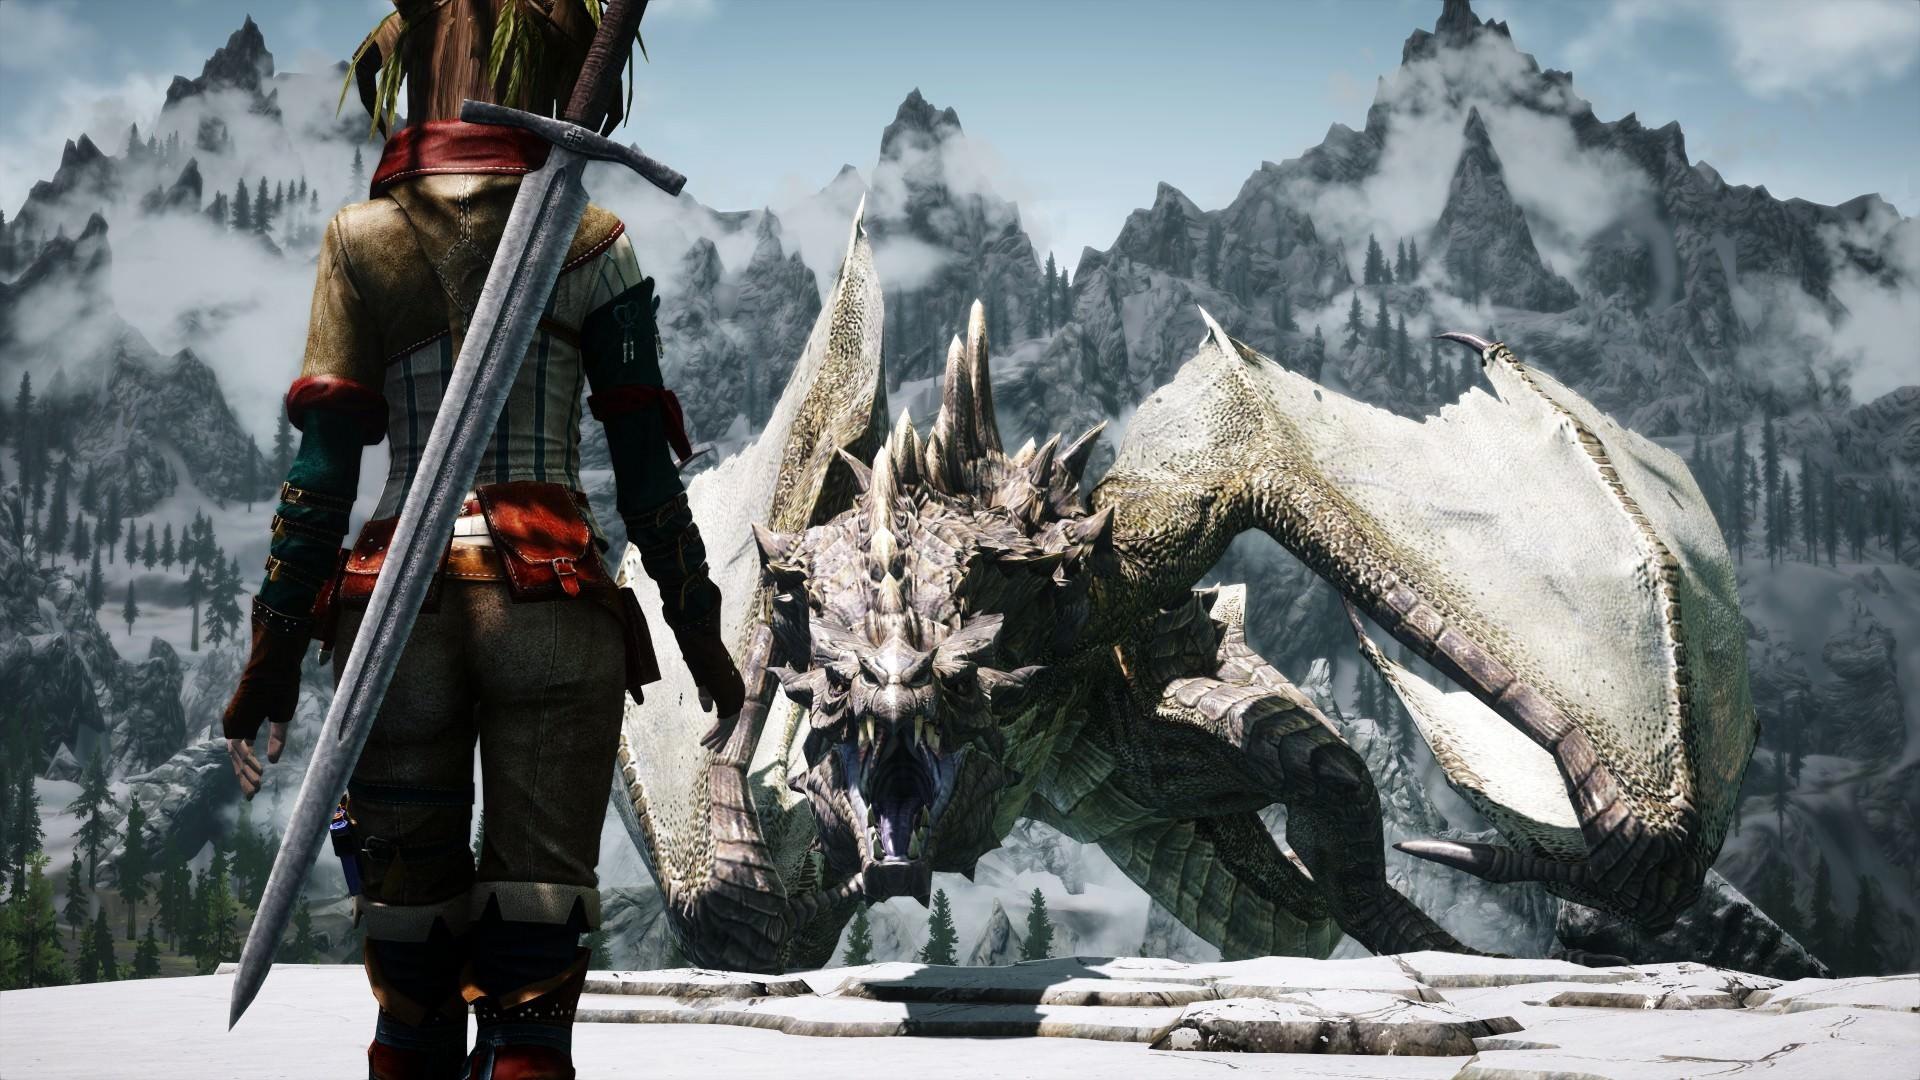 Skyrim Girl vs Dragon Wallpaper – https://digitalart.io/skyrim-